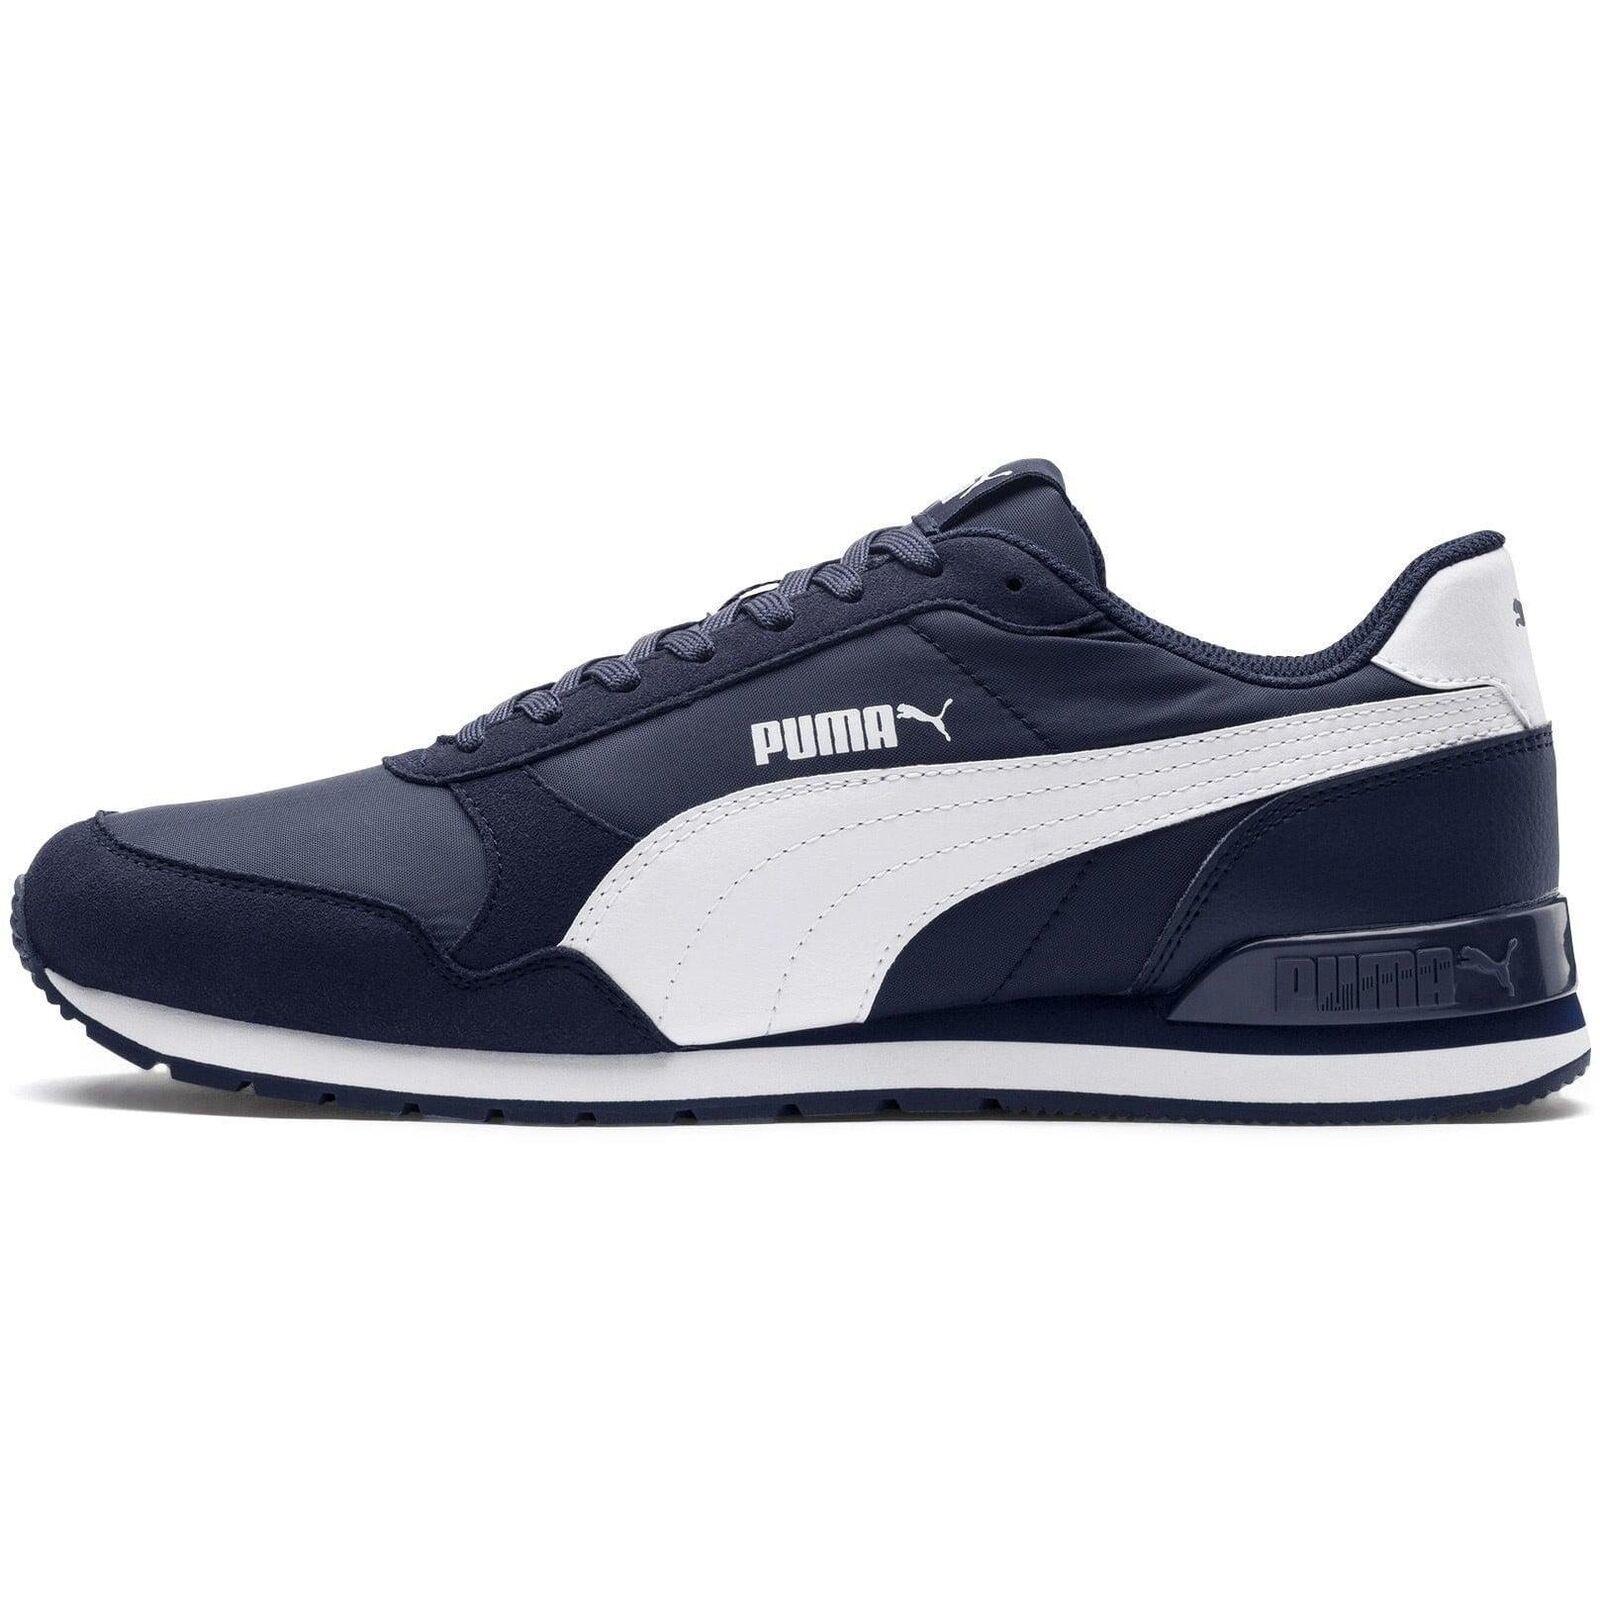 8fa65bc4 Puma ST Runner v2 para hombres zapatos tenis azul marino 36527808 NL  nqvbui7879-Zapatillas deportivas